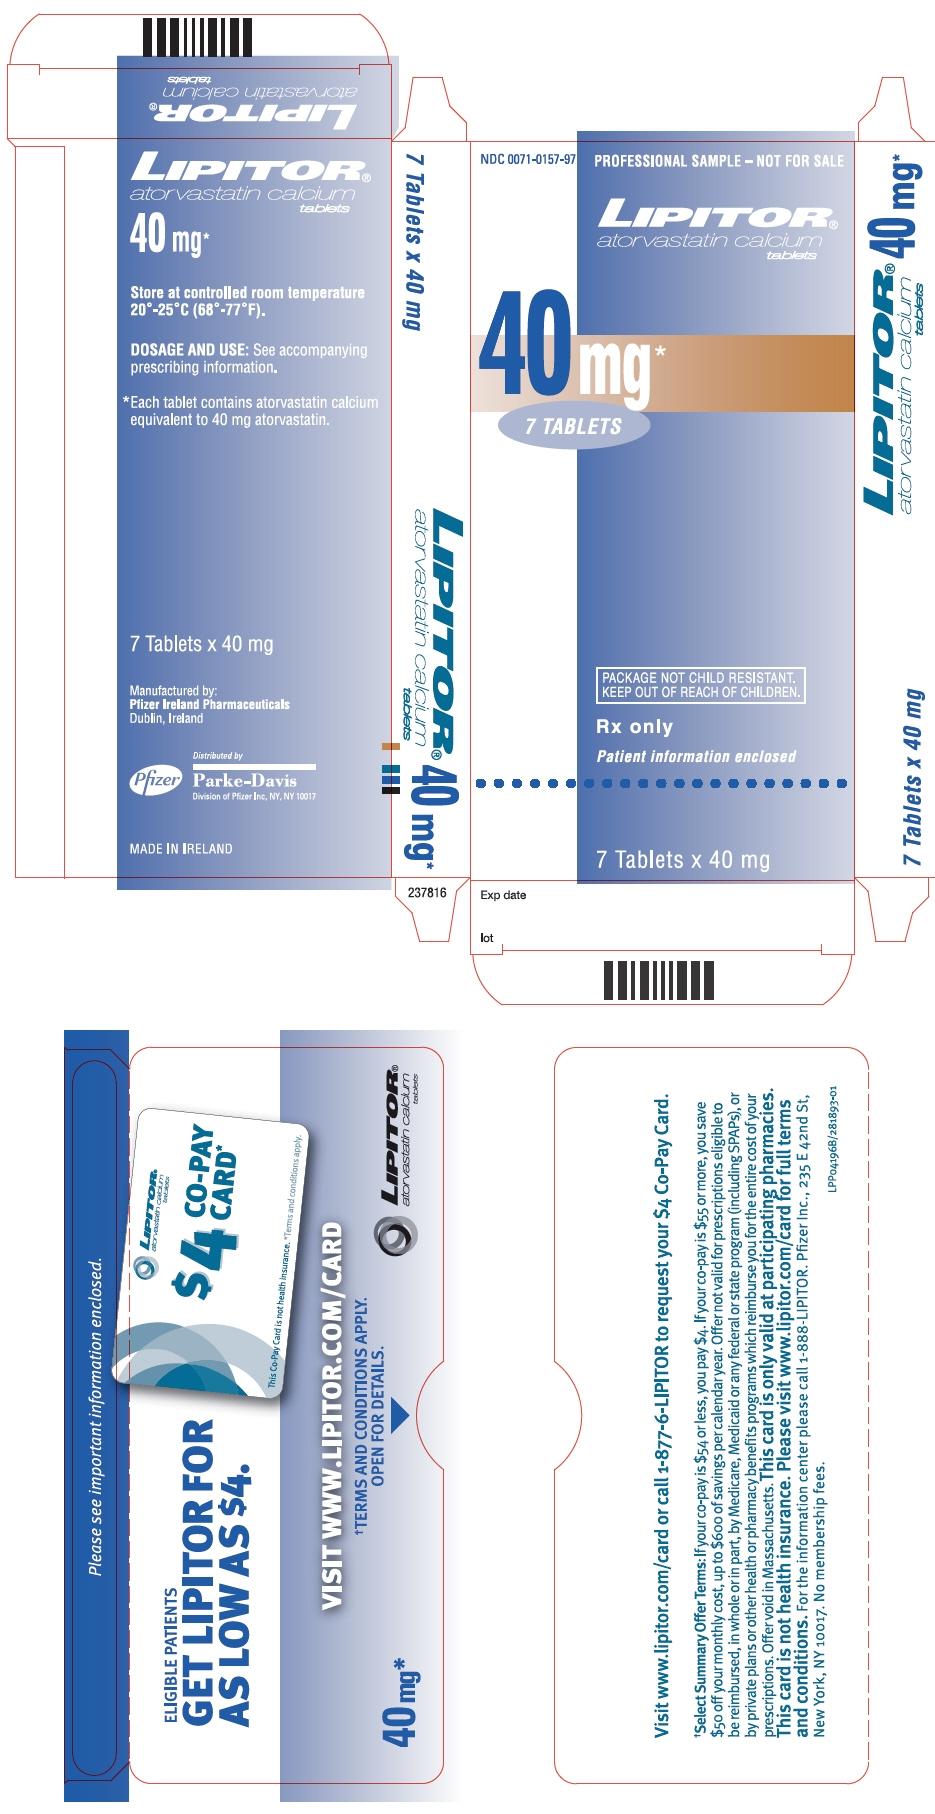 PRINCIPAL DISPLAY PANEL - 40 mg Tablet Packet Carton